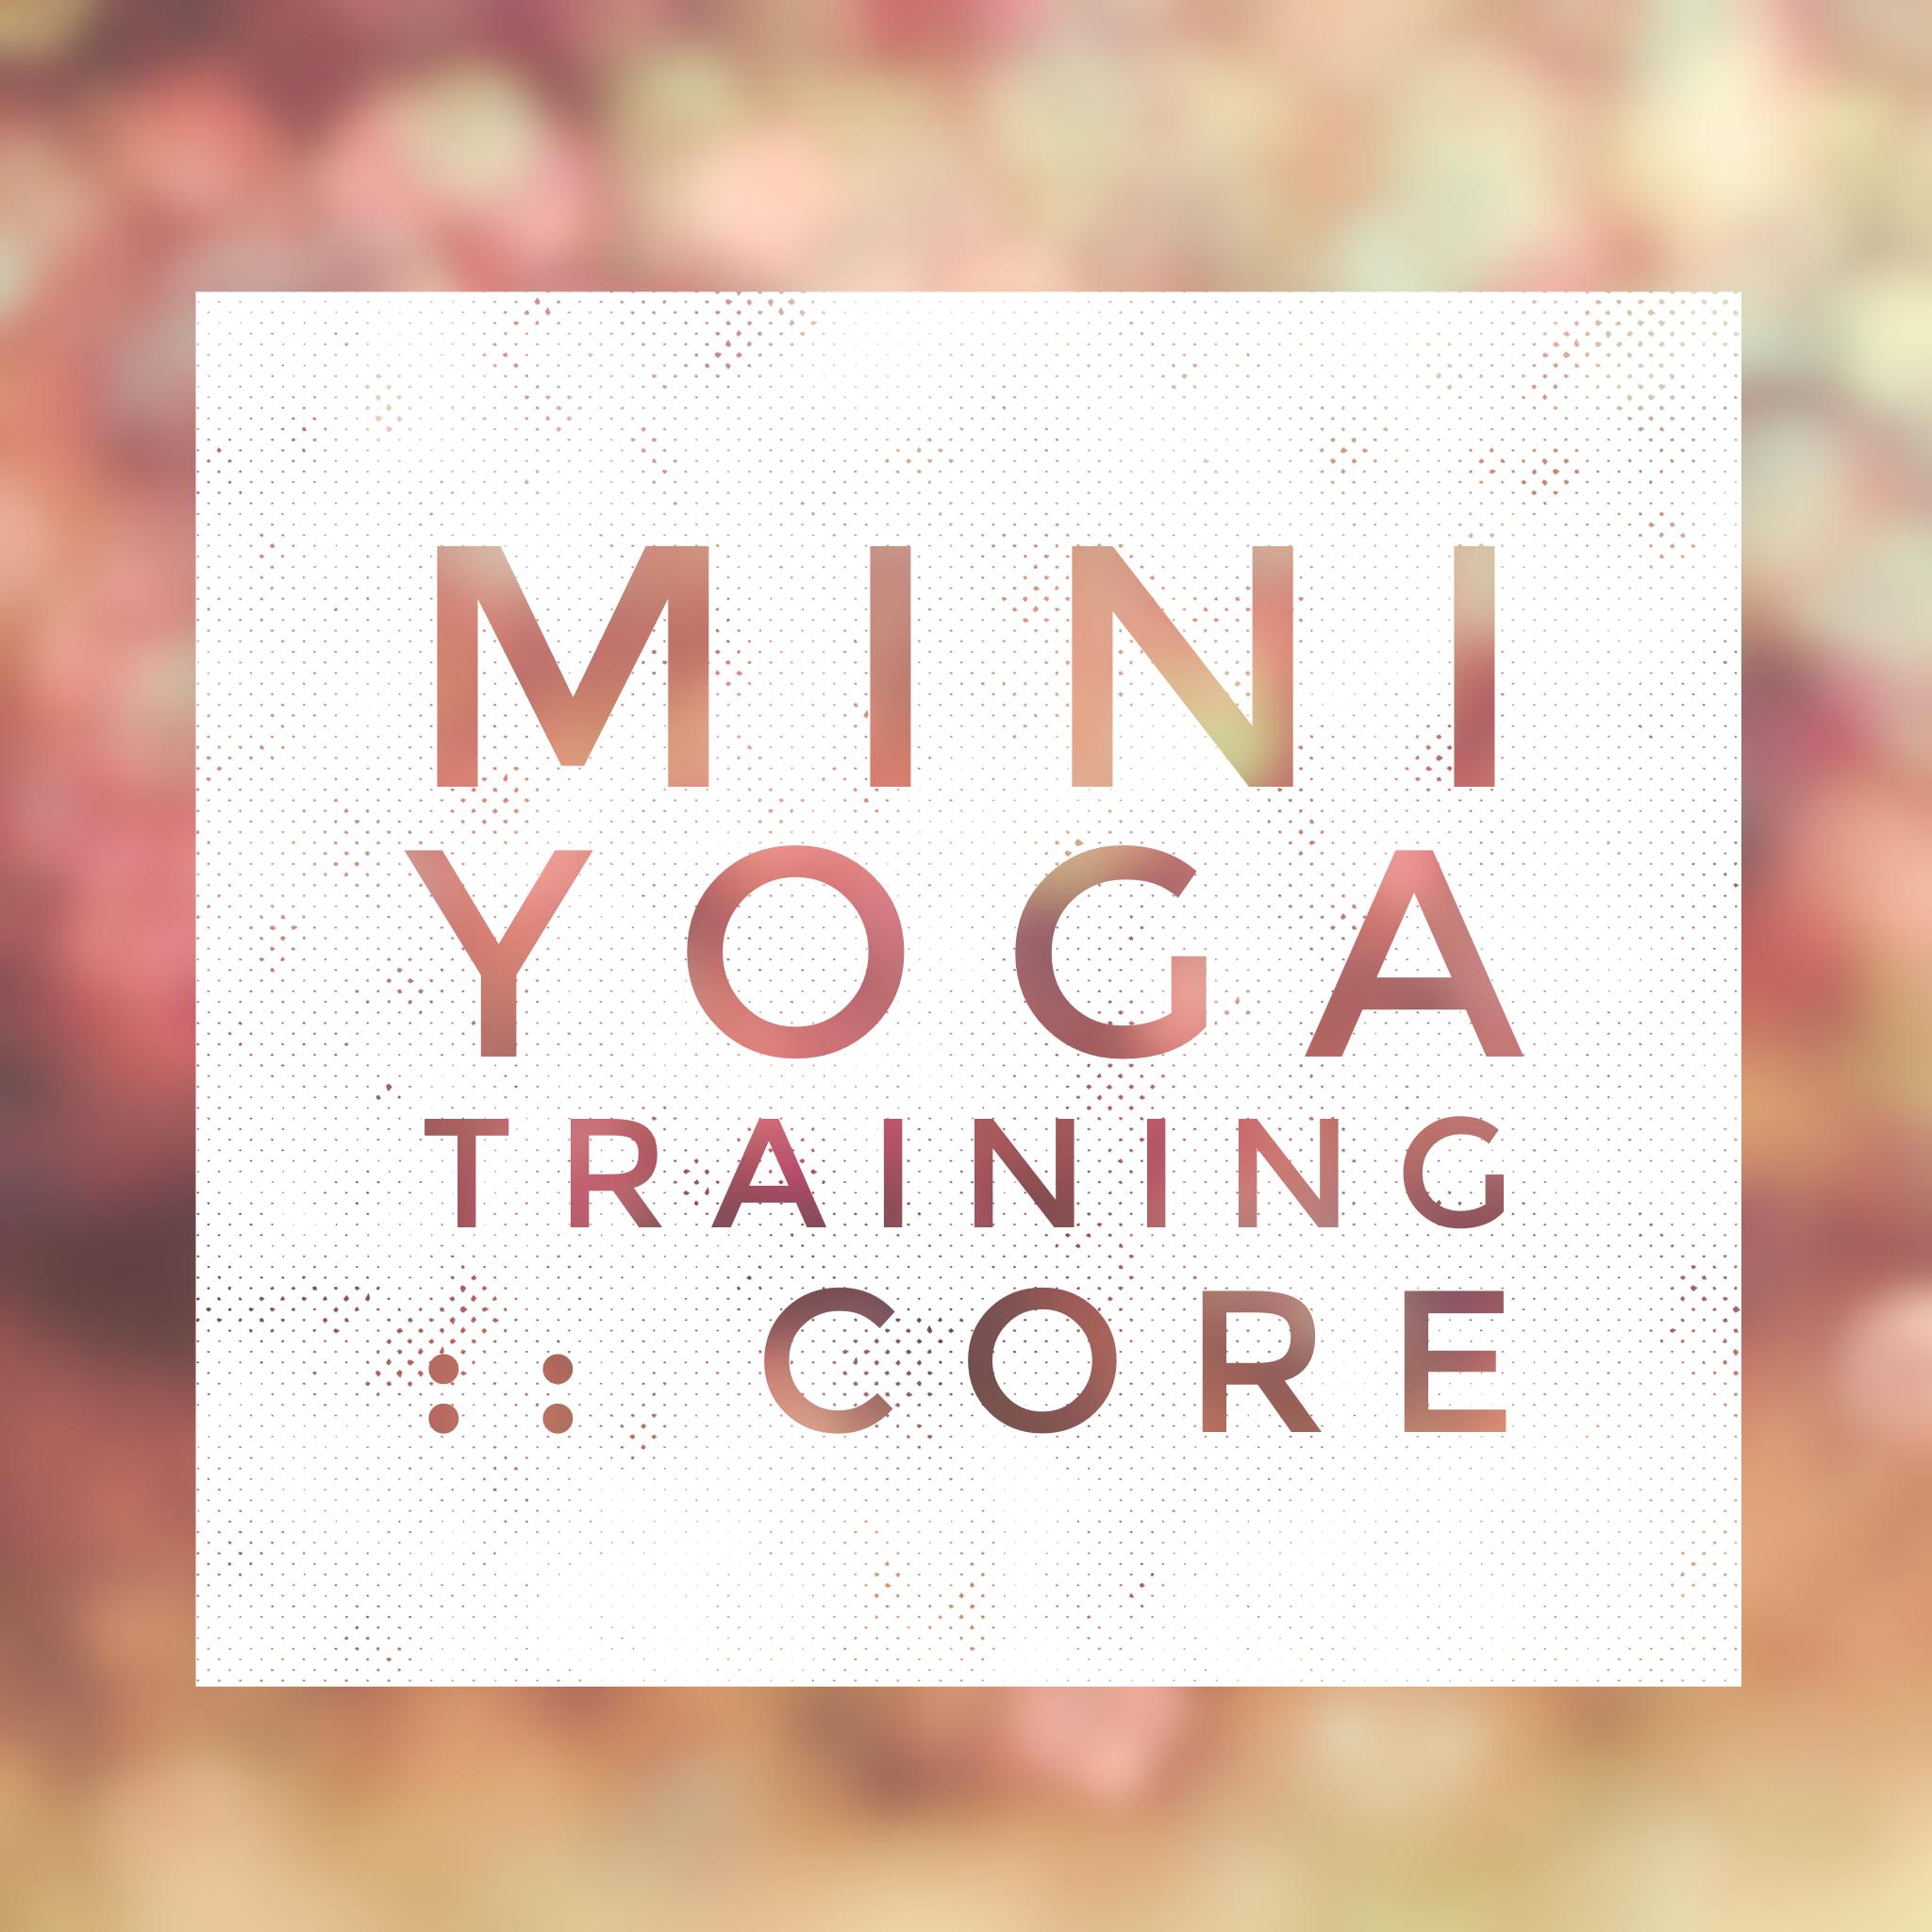 free core training